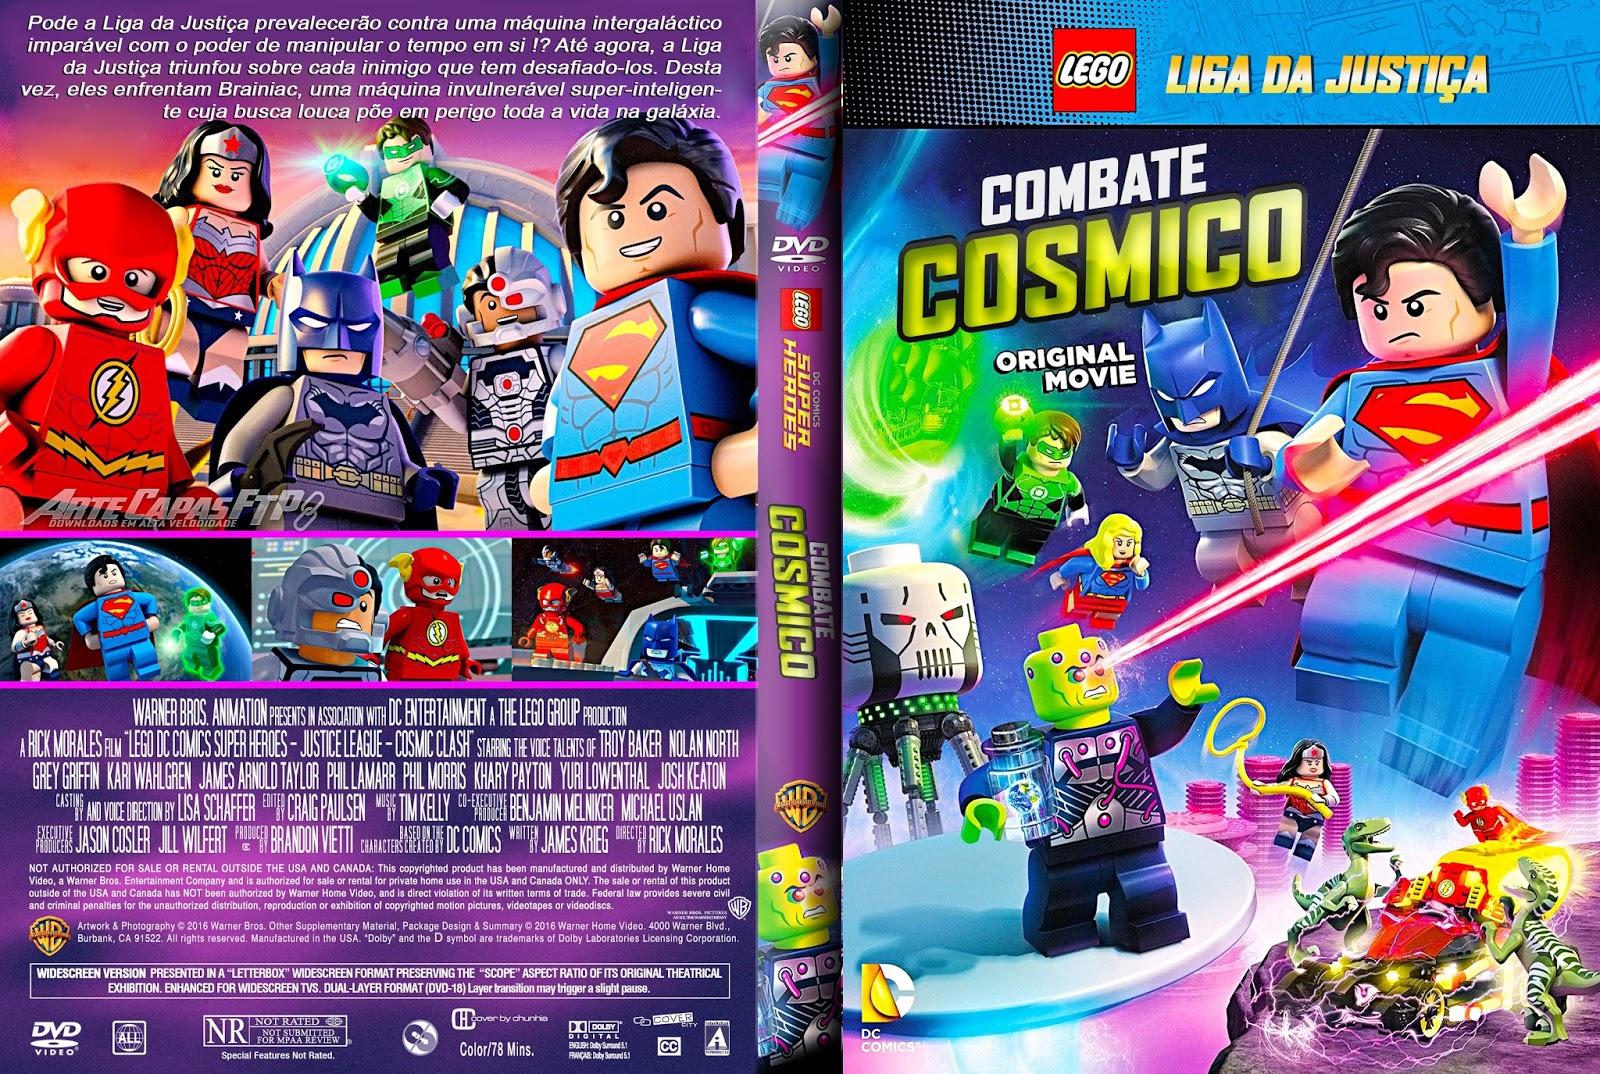 Liga da Justiça Lego Combate Cósmico BluRay 720p Dual Audio Liga 2Bda 2BJusti 25C3 25A7a 2BLego 2BCombate 2BC 25C3 25B3smico 2B  2BXANDAODOWNLOAD